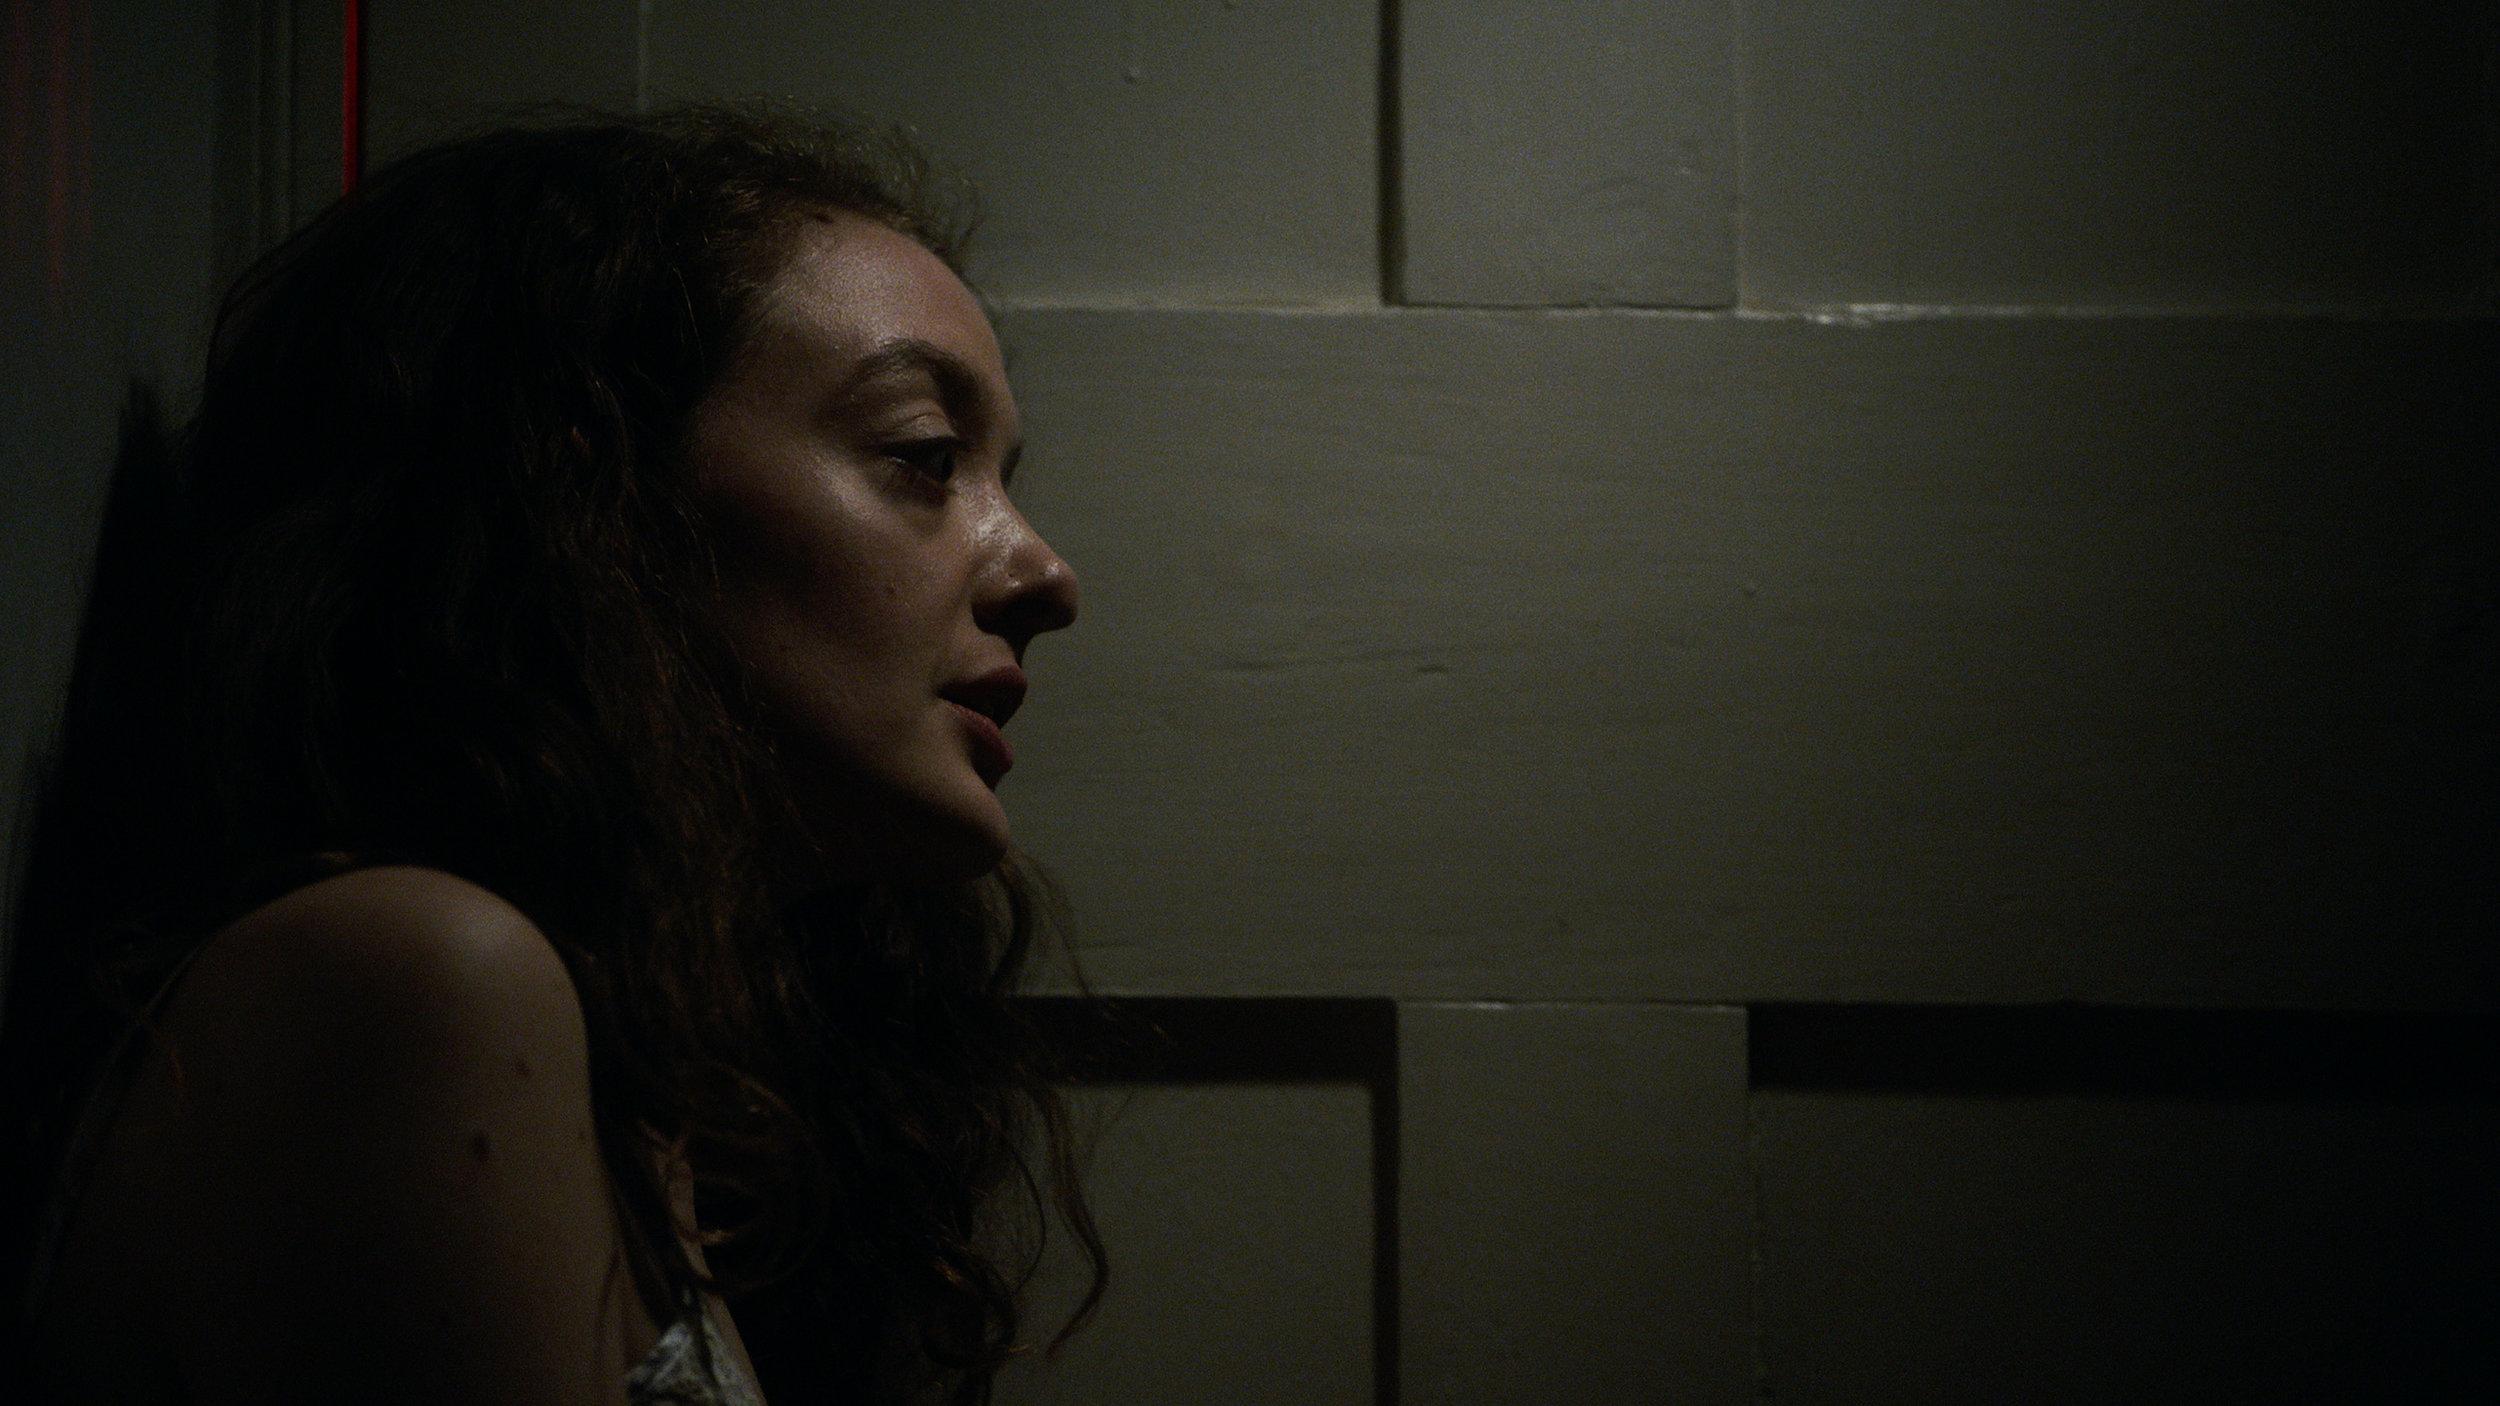 A Quiet Room in Walthamstow - Ellie Woodruff-Bryant 04.jpg